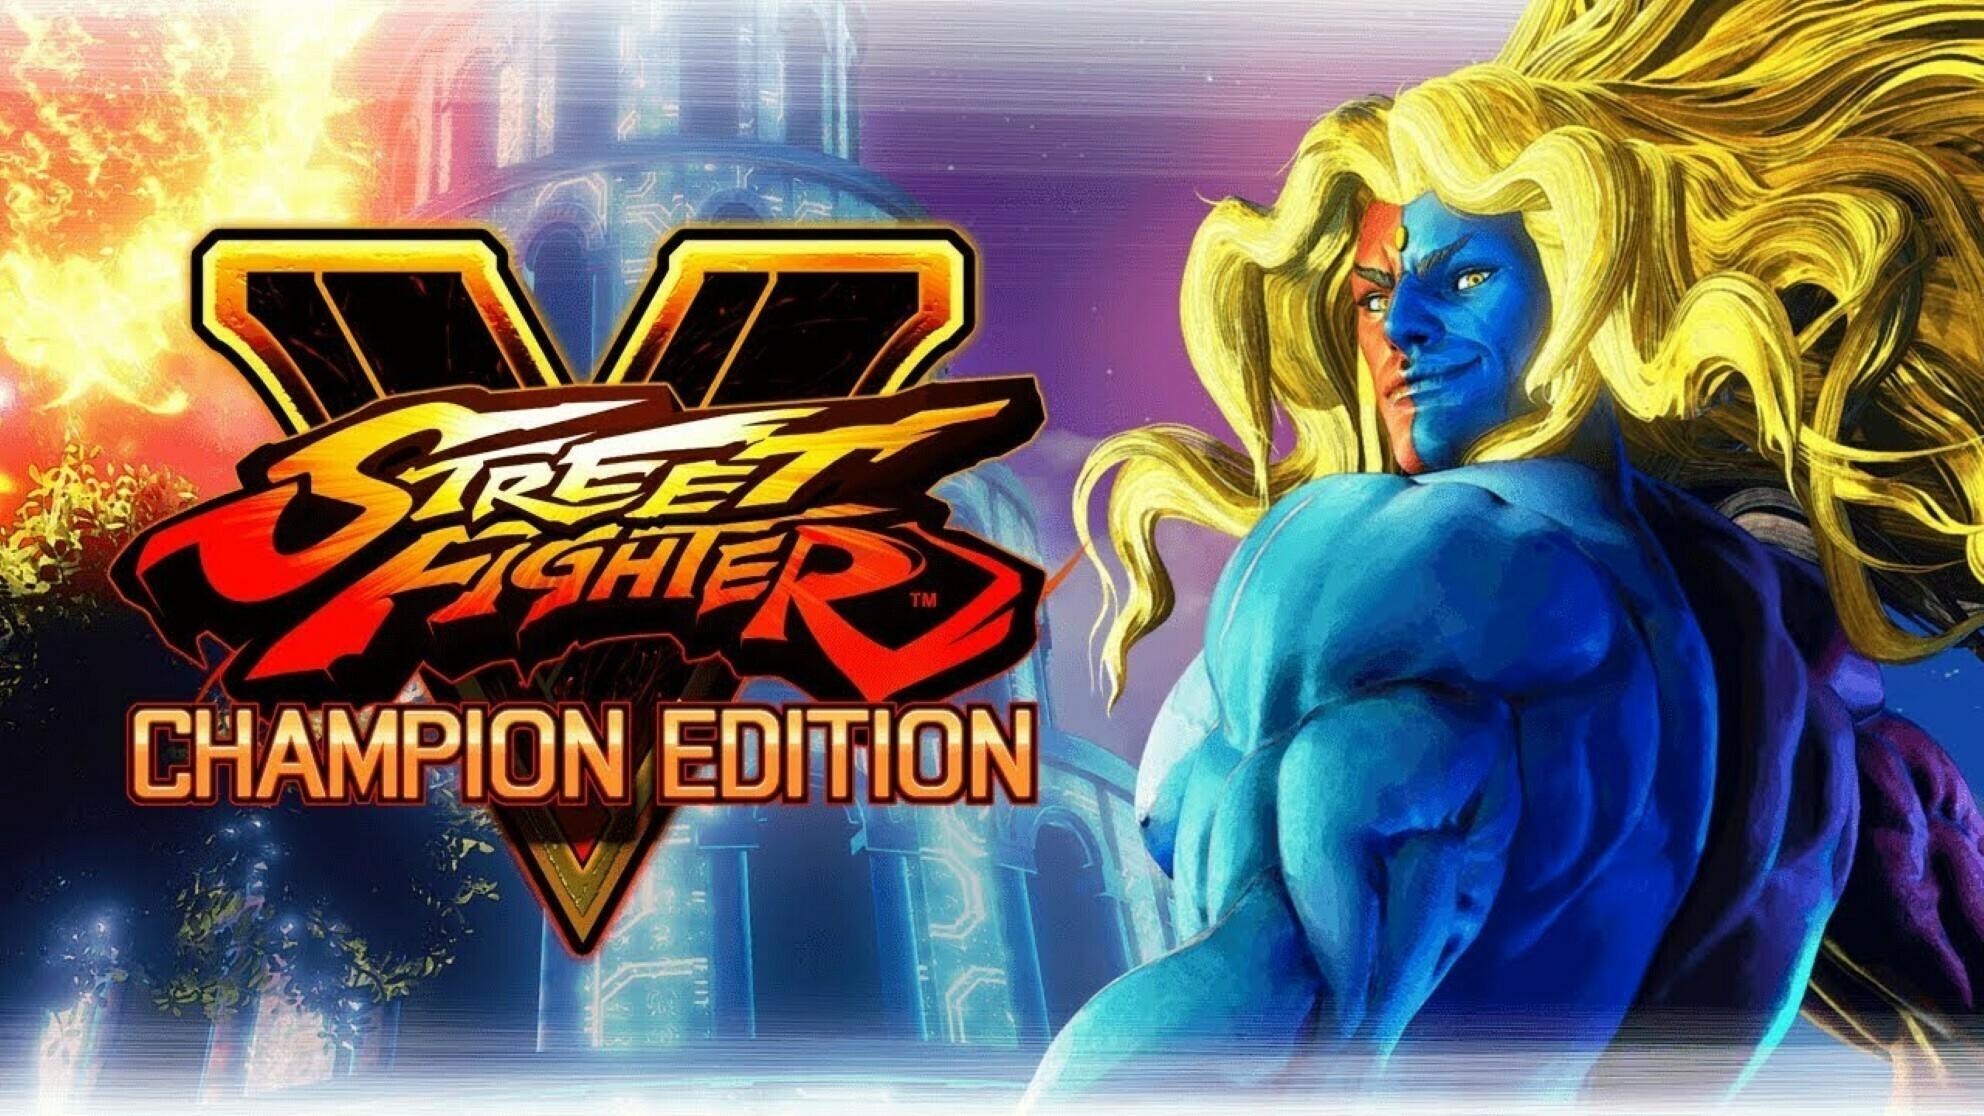 Street Fighter 5 Tournament Mode open beta registration begins